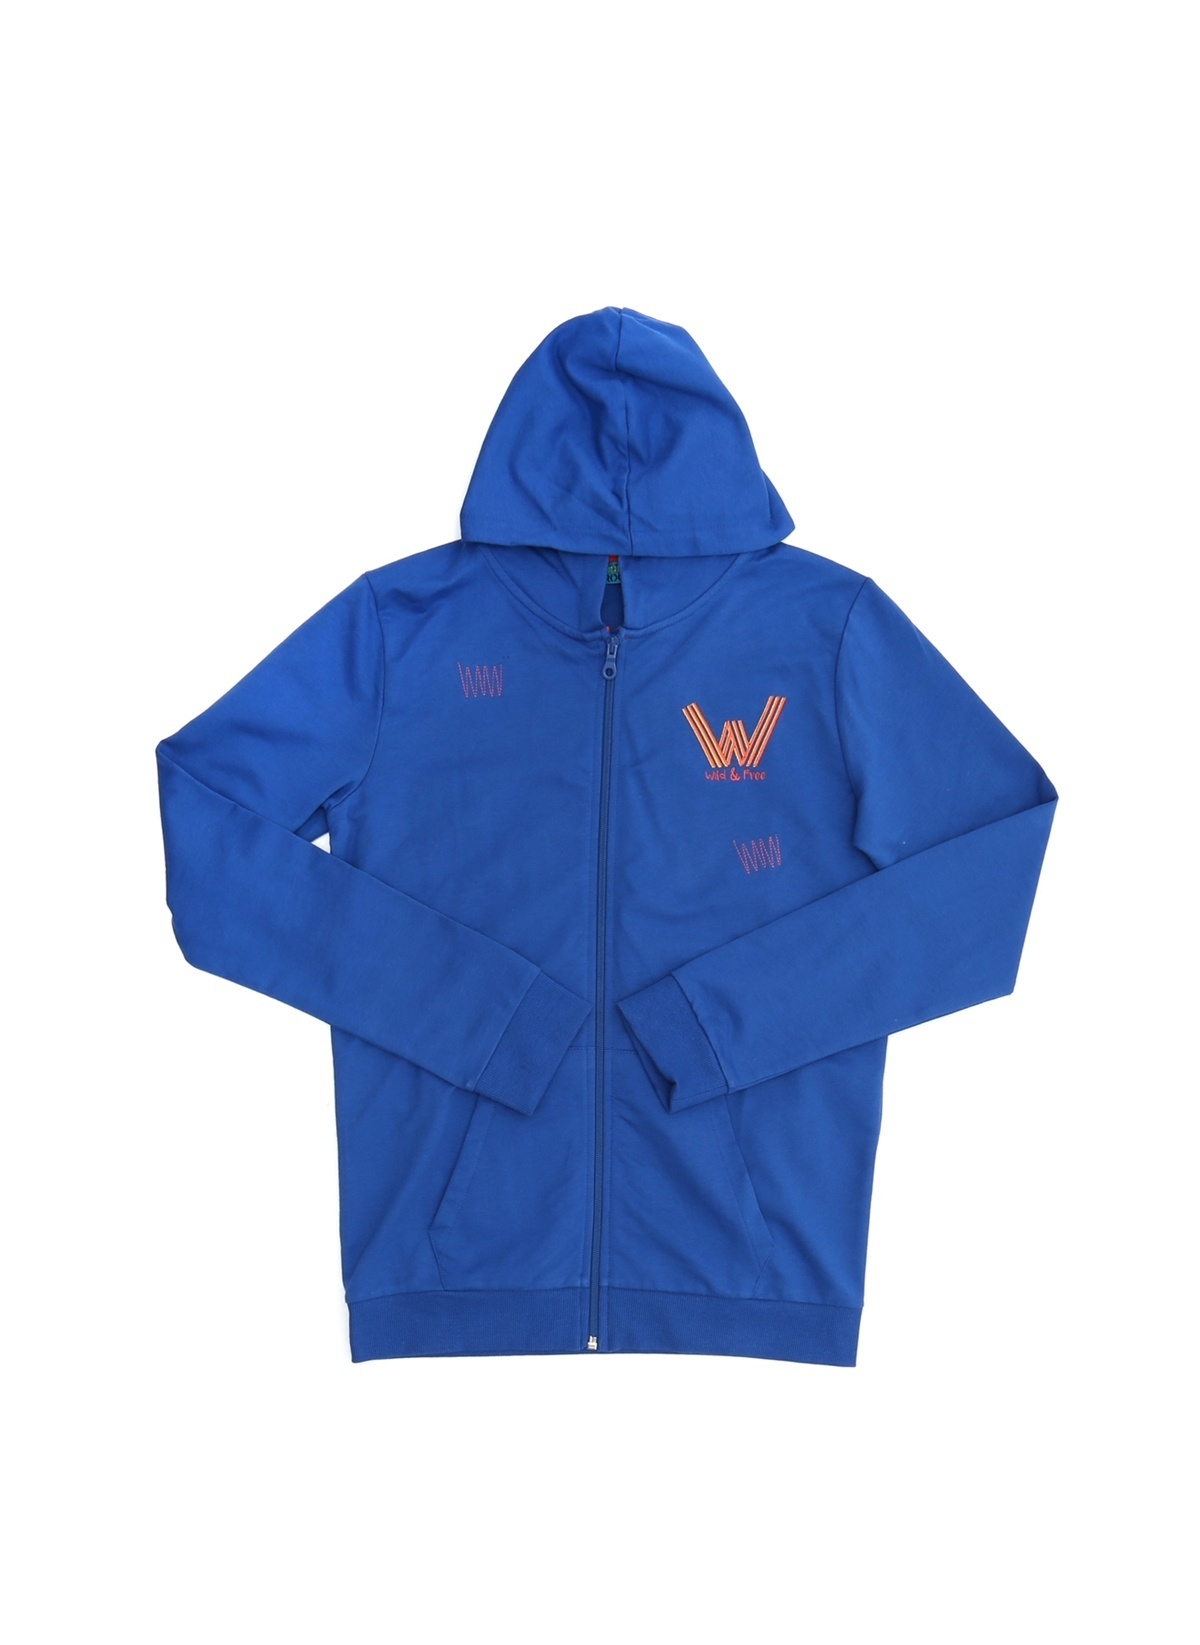 Funky Rocks Sweatshirt 72kla Ubr-06 Eee Sweatmont – 29.99 TL